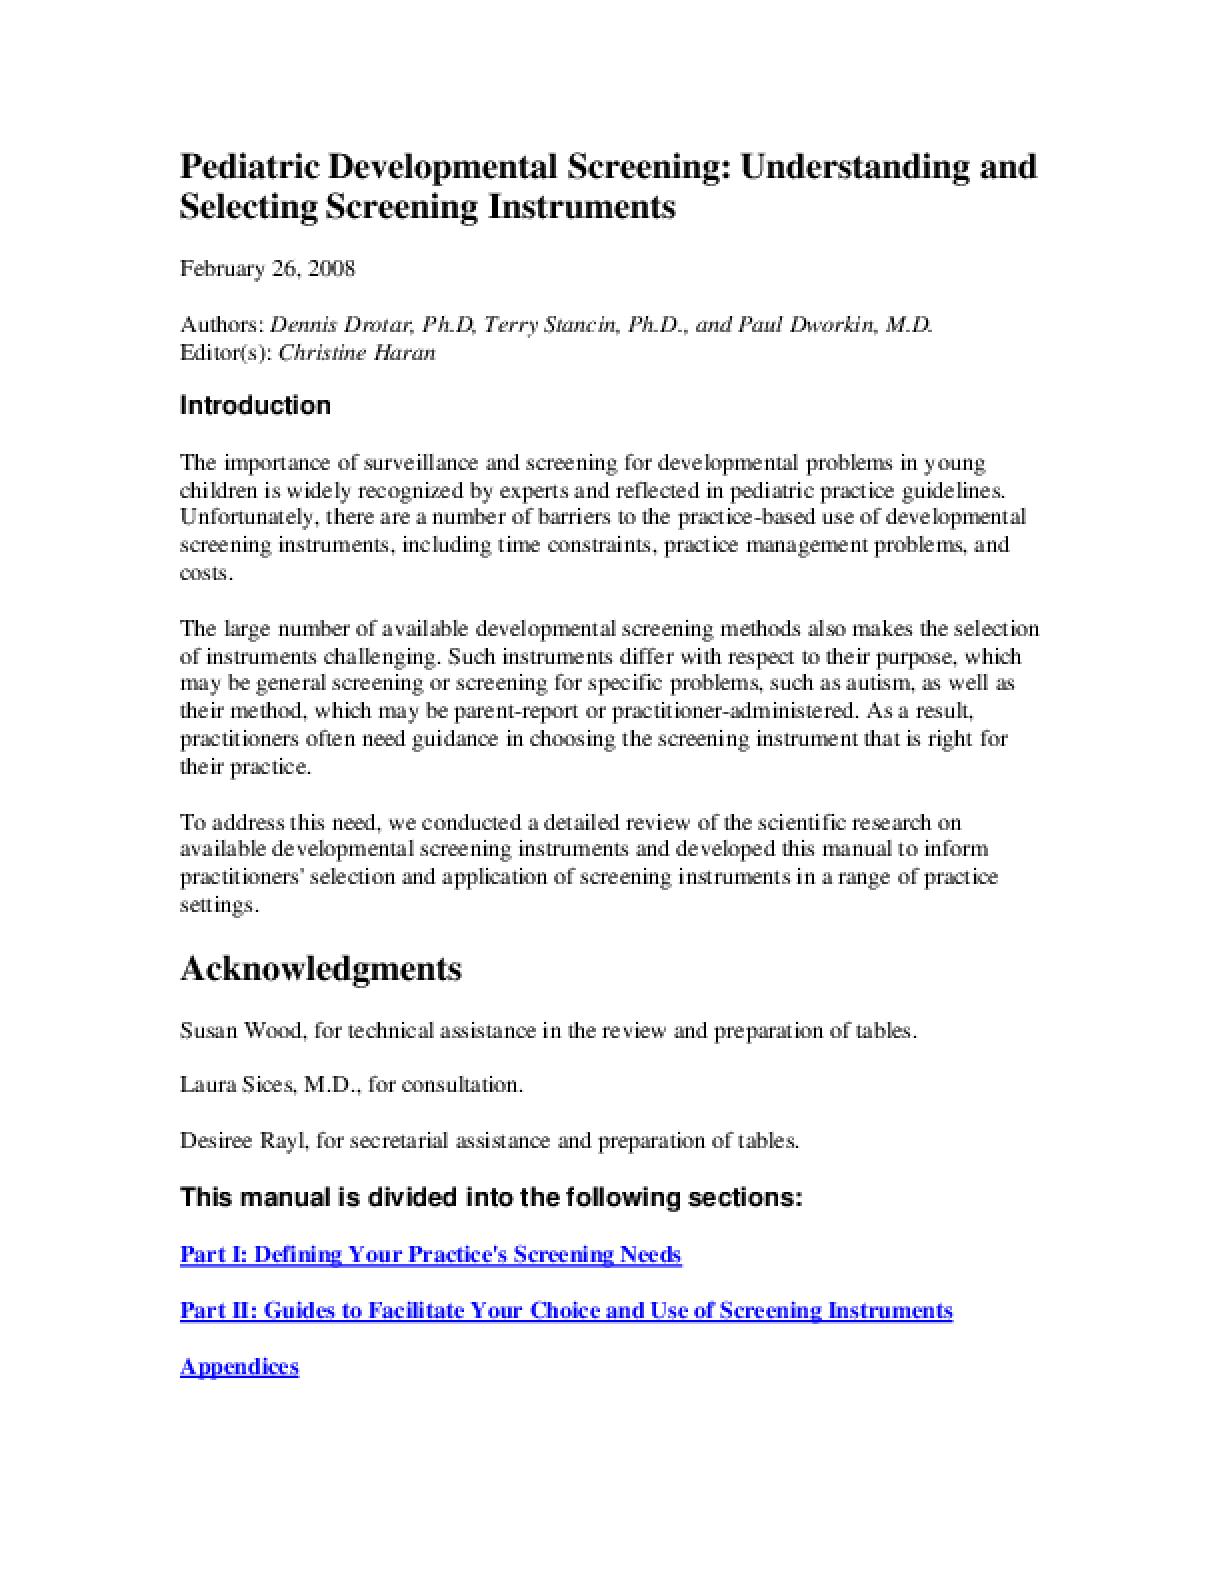 Pediatric Developmental Screening: Understanding and Selecting Screening Instruments